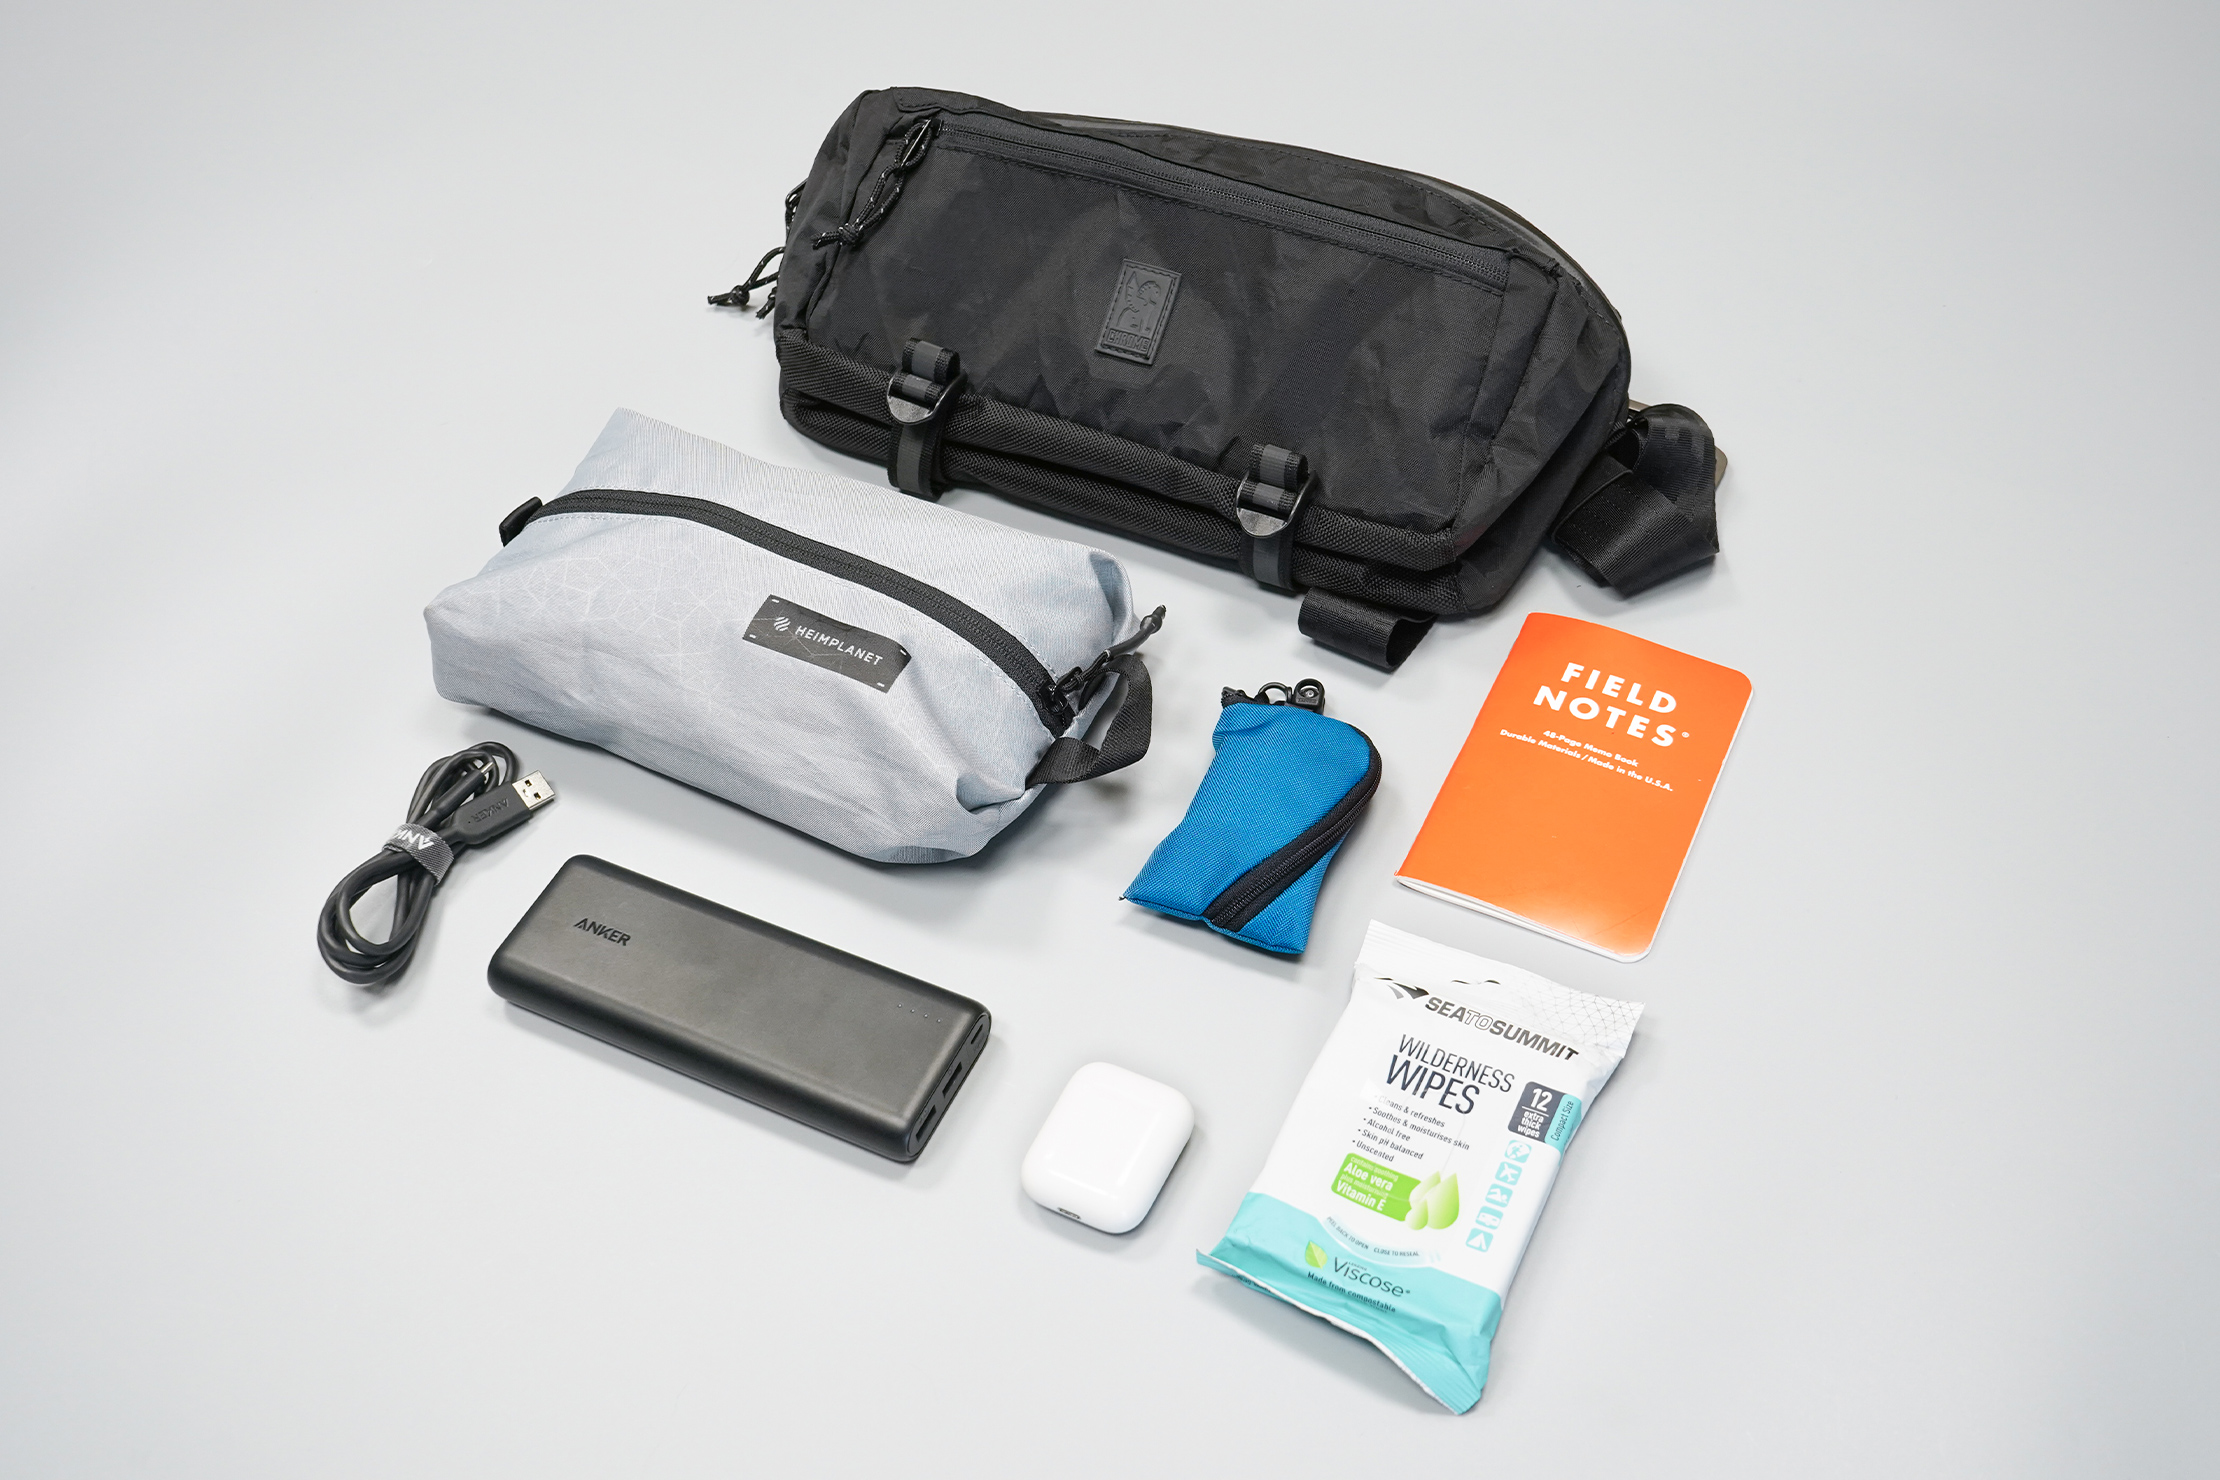 Chrome Industries Mini Kadet | The sling laid out